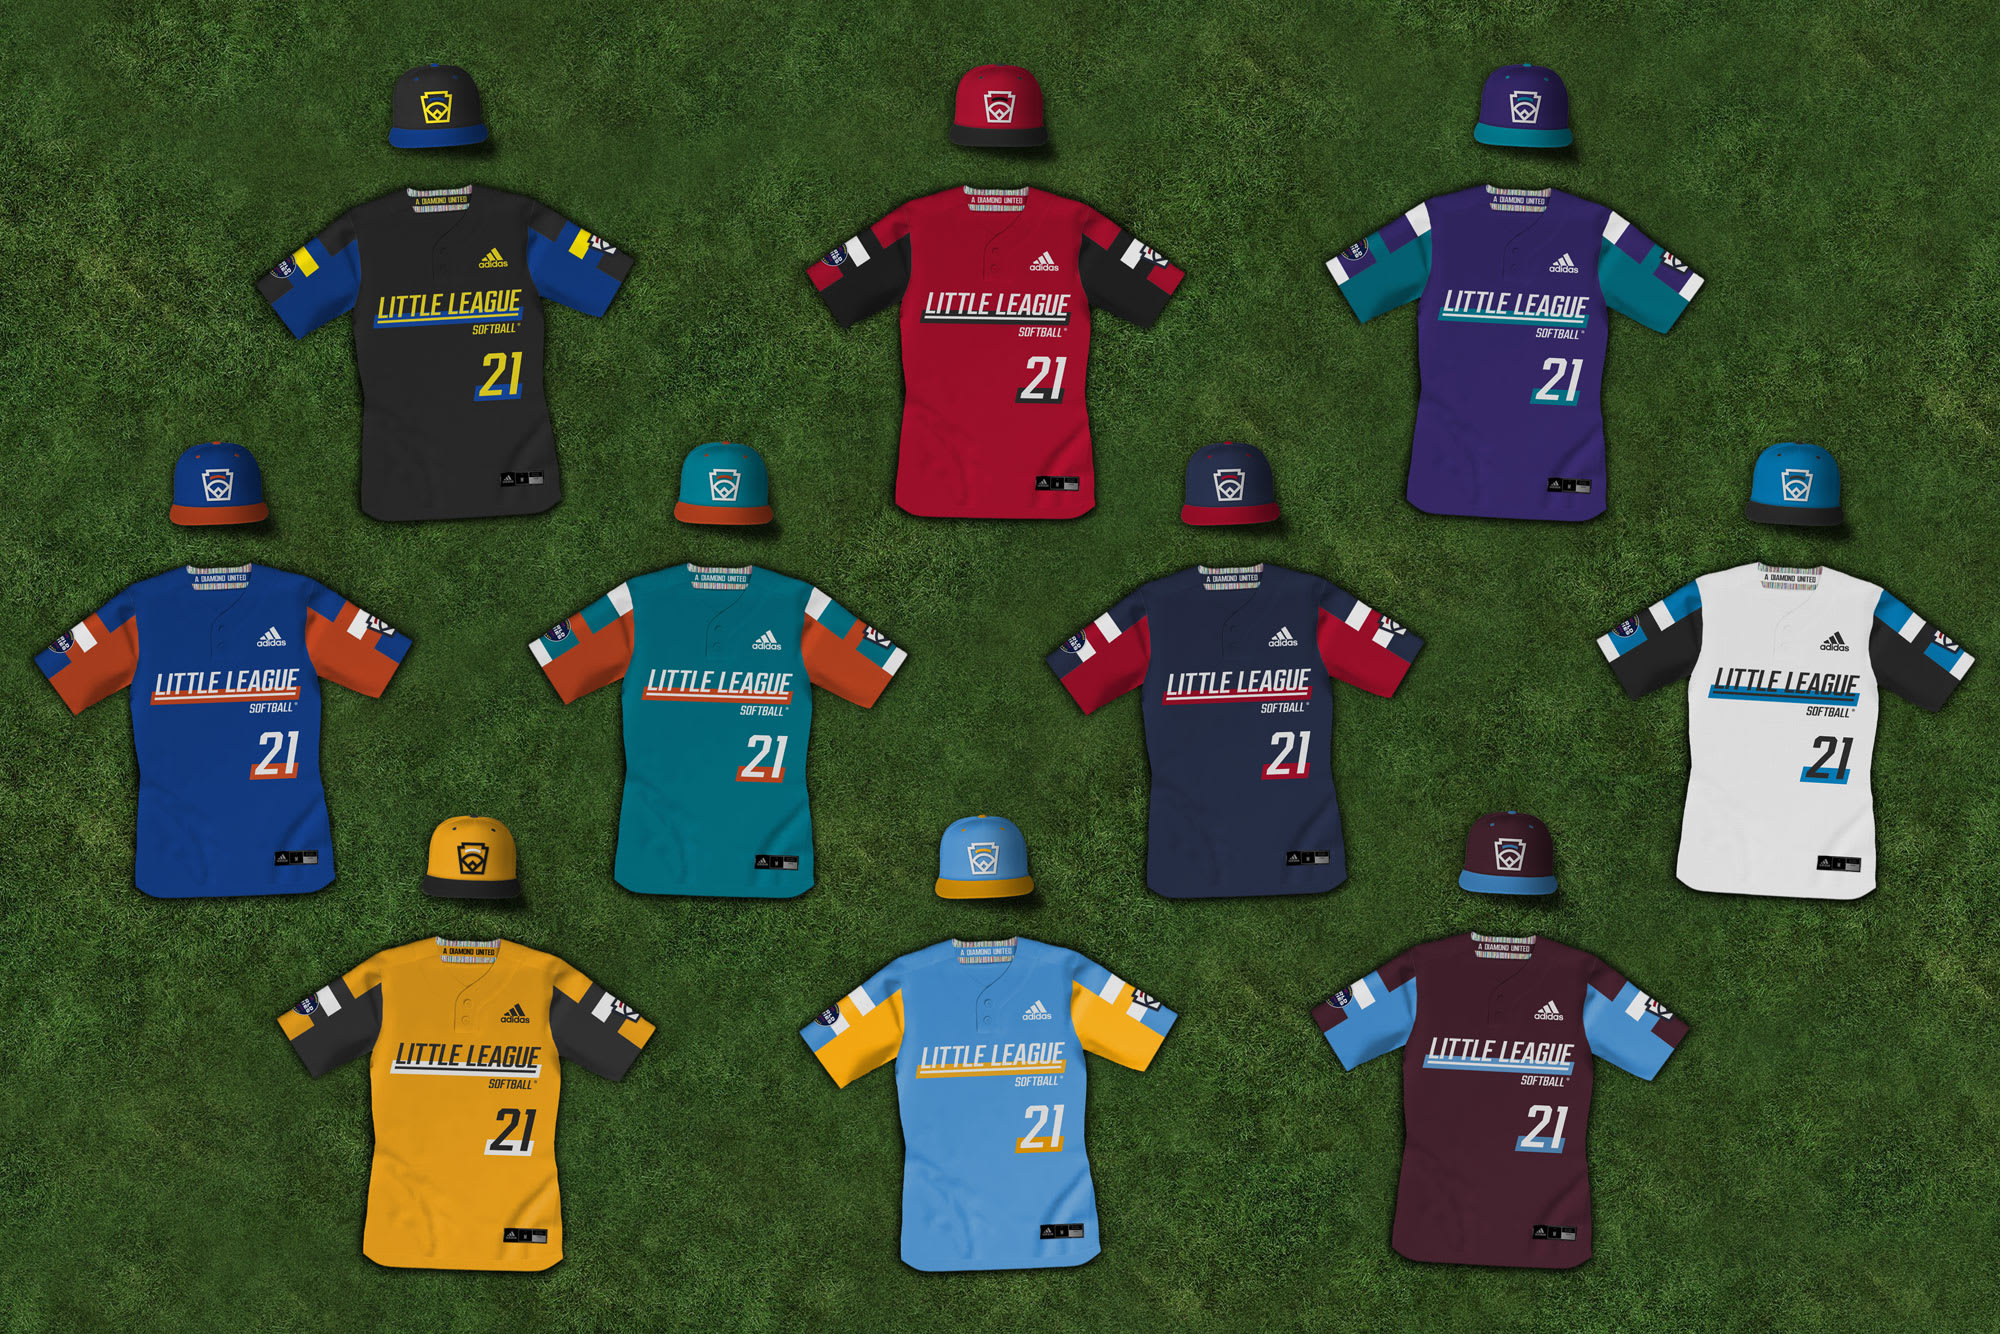 2021 LLSWS Uniforms